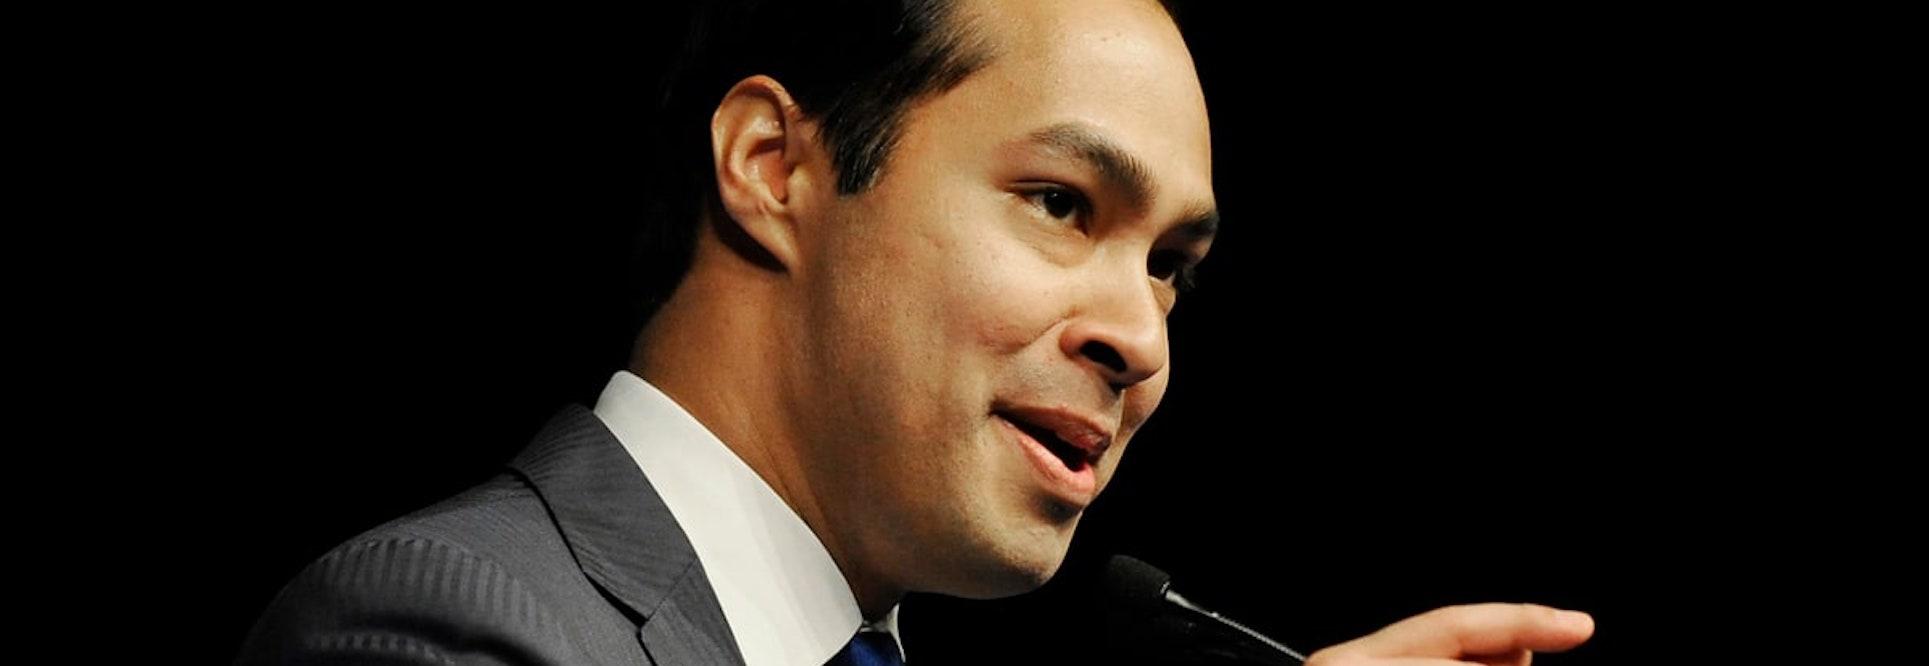 A Latino President?